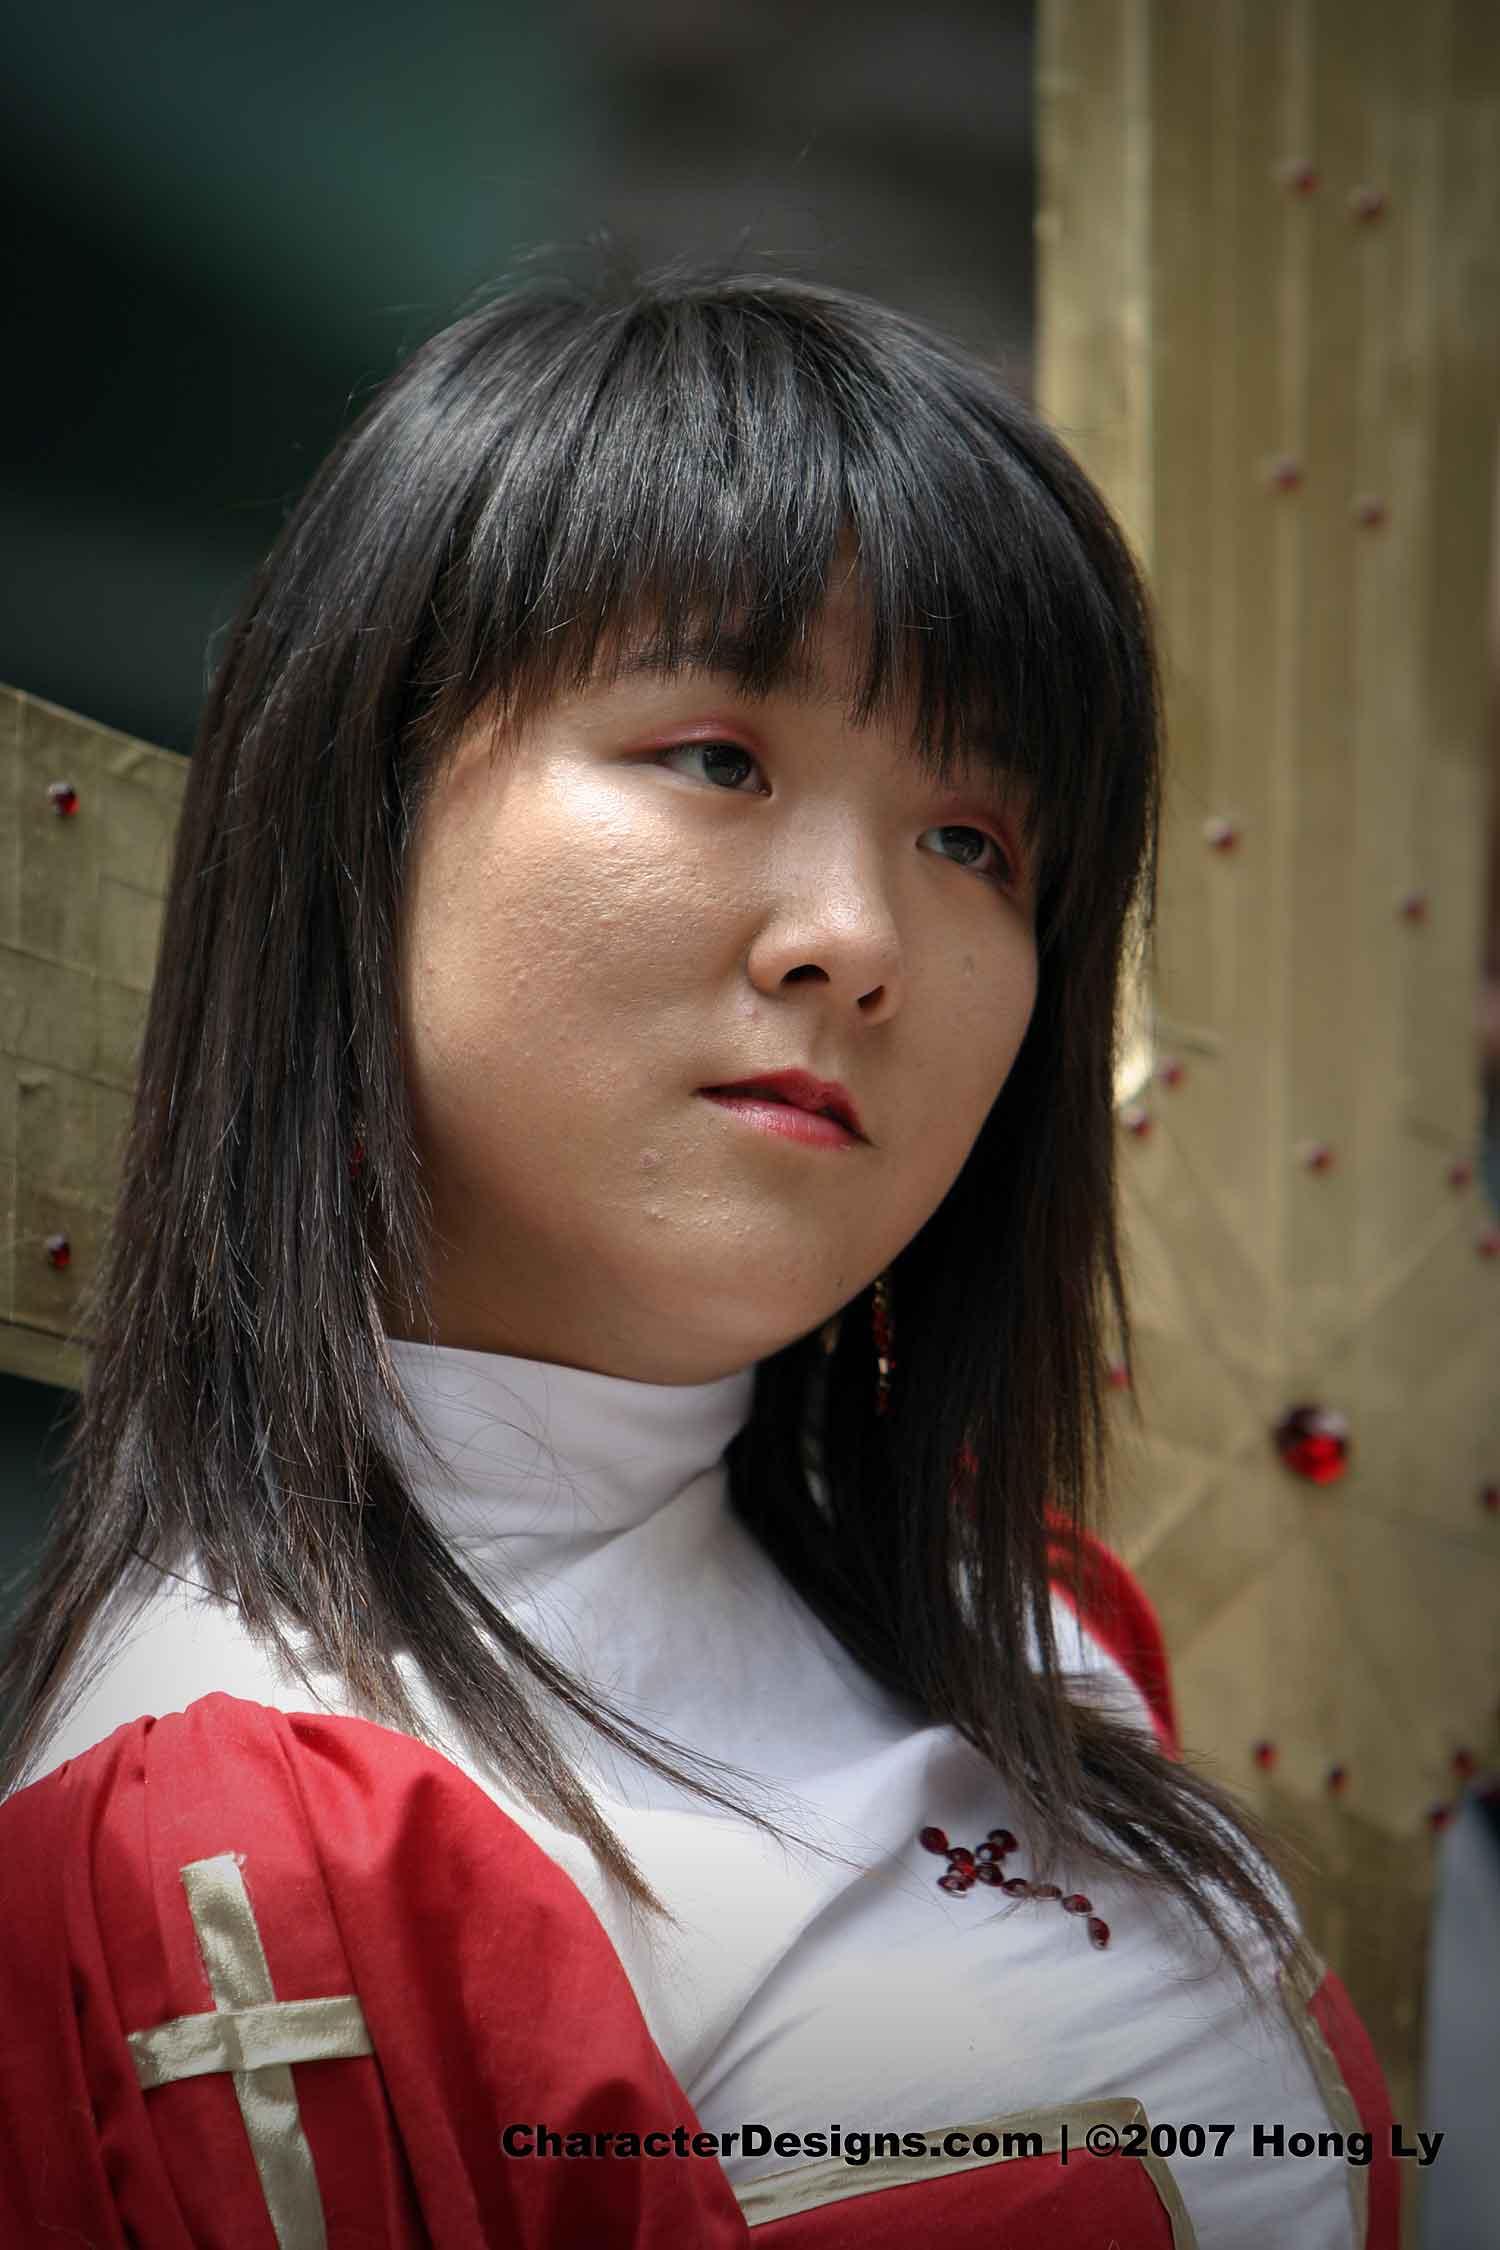 Faces_of_AX_2006_283.jpg